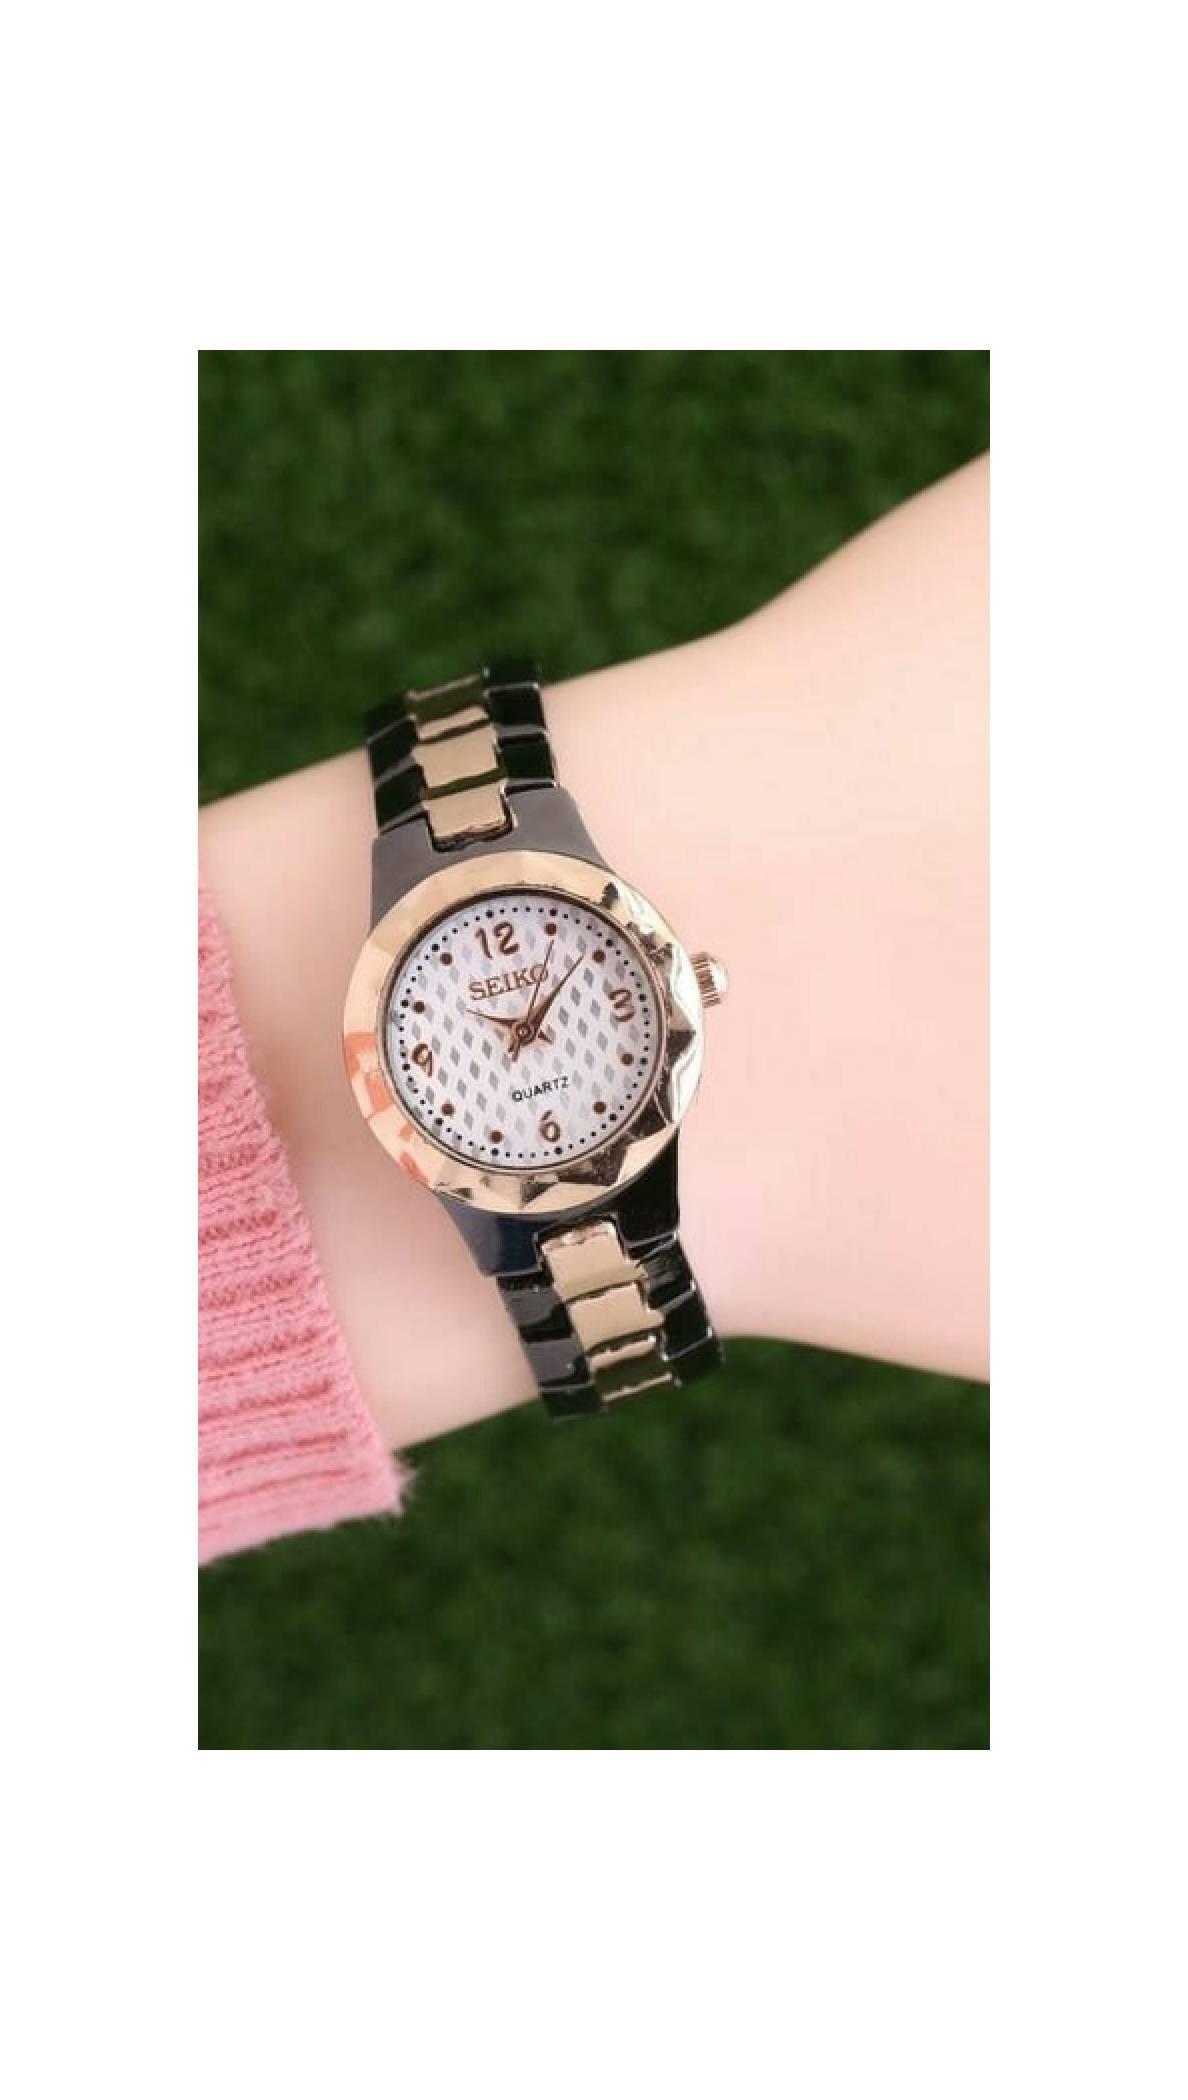 jam tangan wanita hitam gold emas black seiko merk kw bagus keren